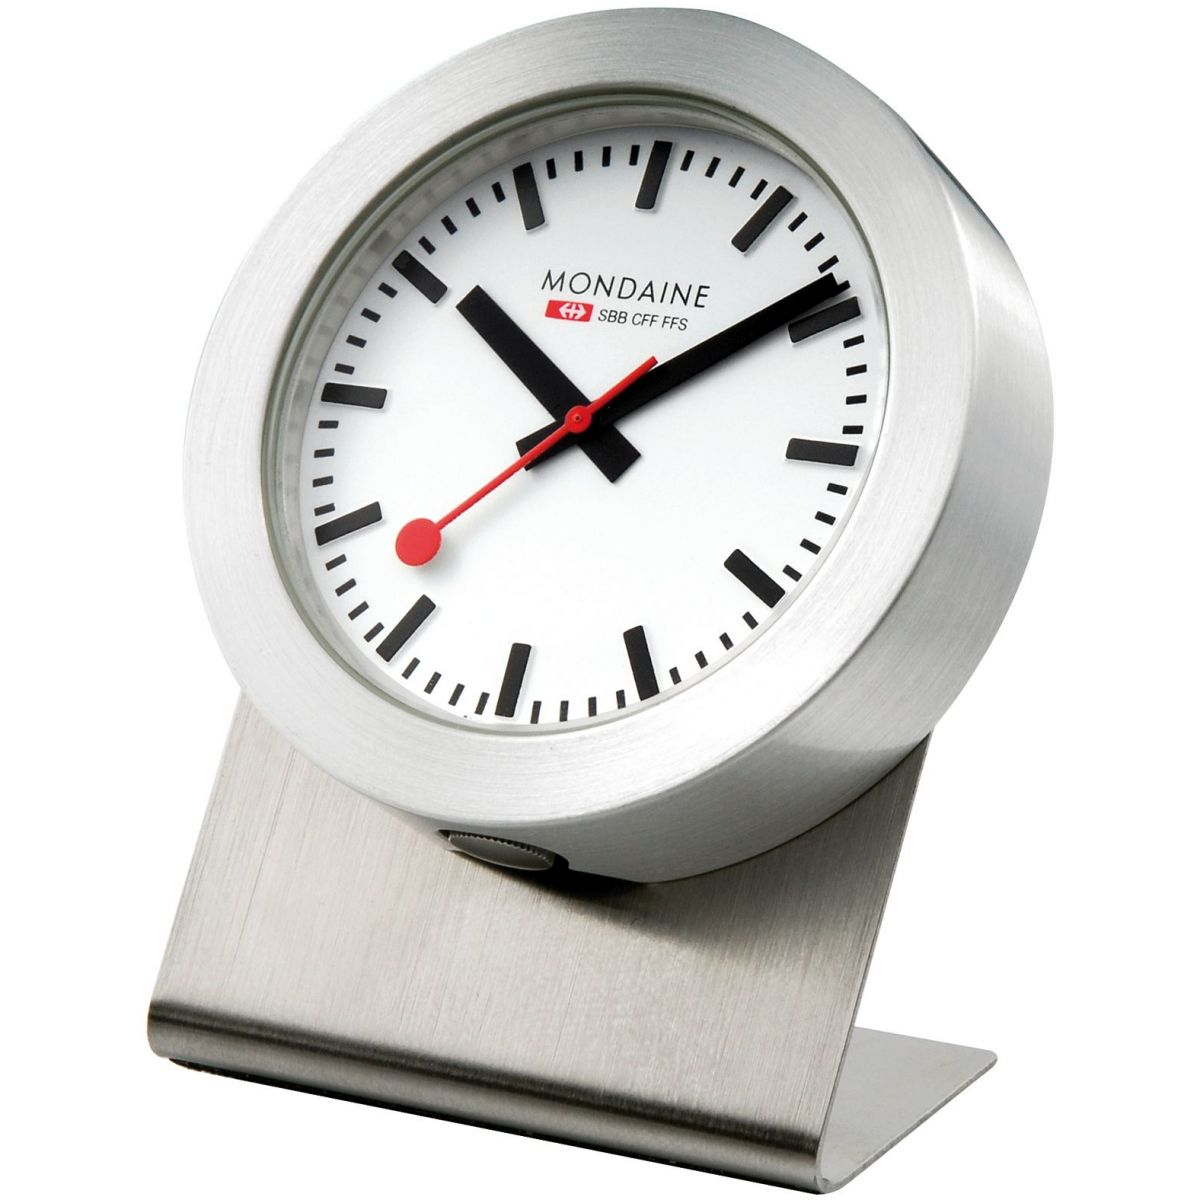 mondaine suisse railways magn tique bureau horloge. Black Bedroom Furniture Sets. Home Design Ideas